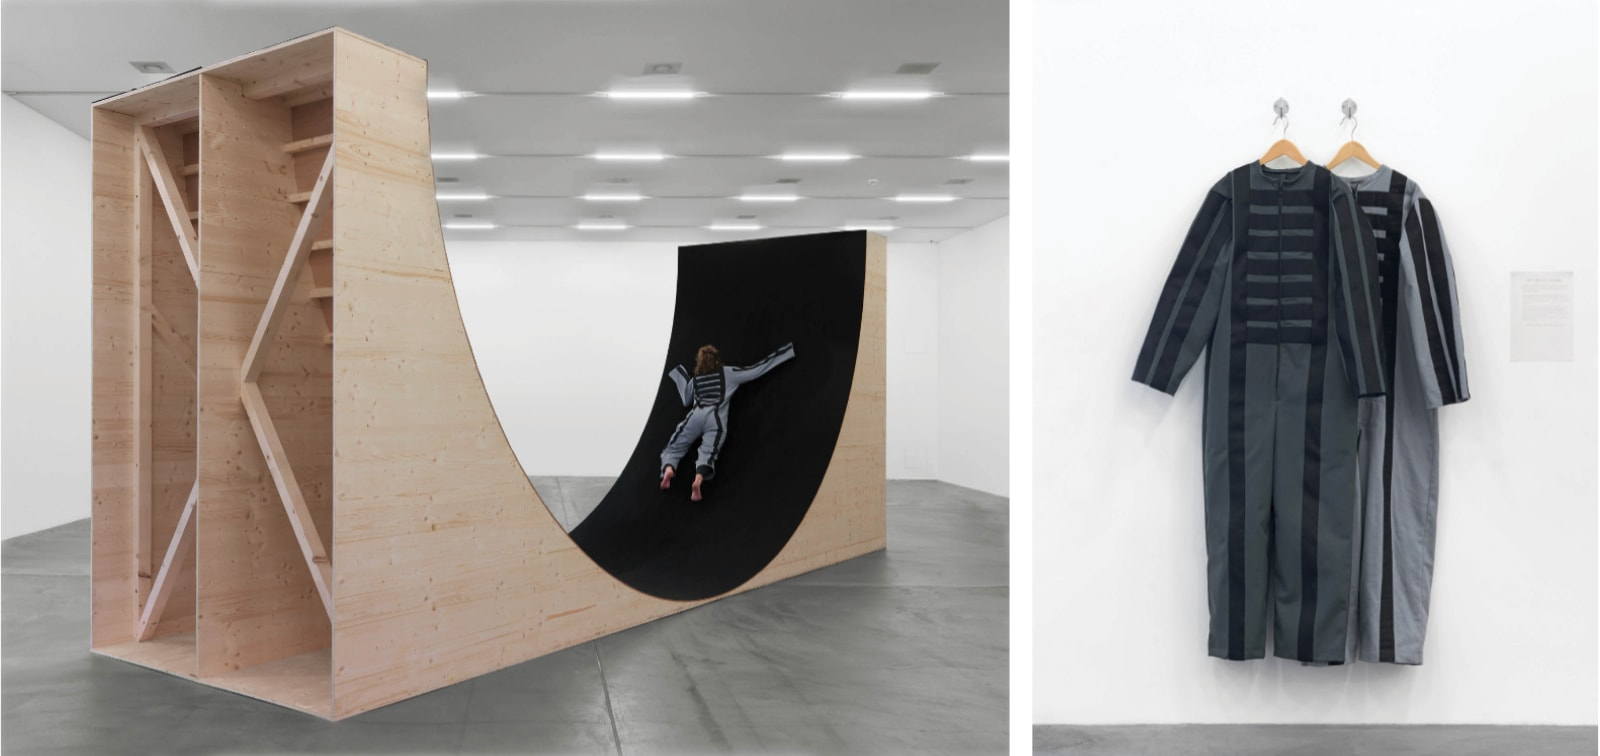 Martha Araújo, Para Um Corpo Nas Suas Impossibilidades, 1985 on view at Resistance Performed, Migros Museum, Zurich, 2015